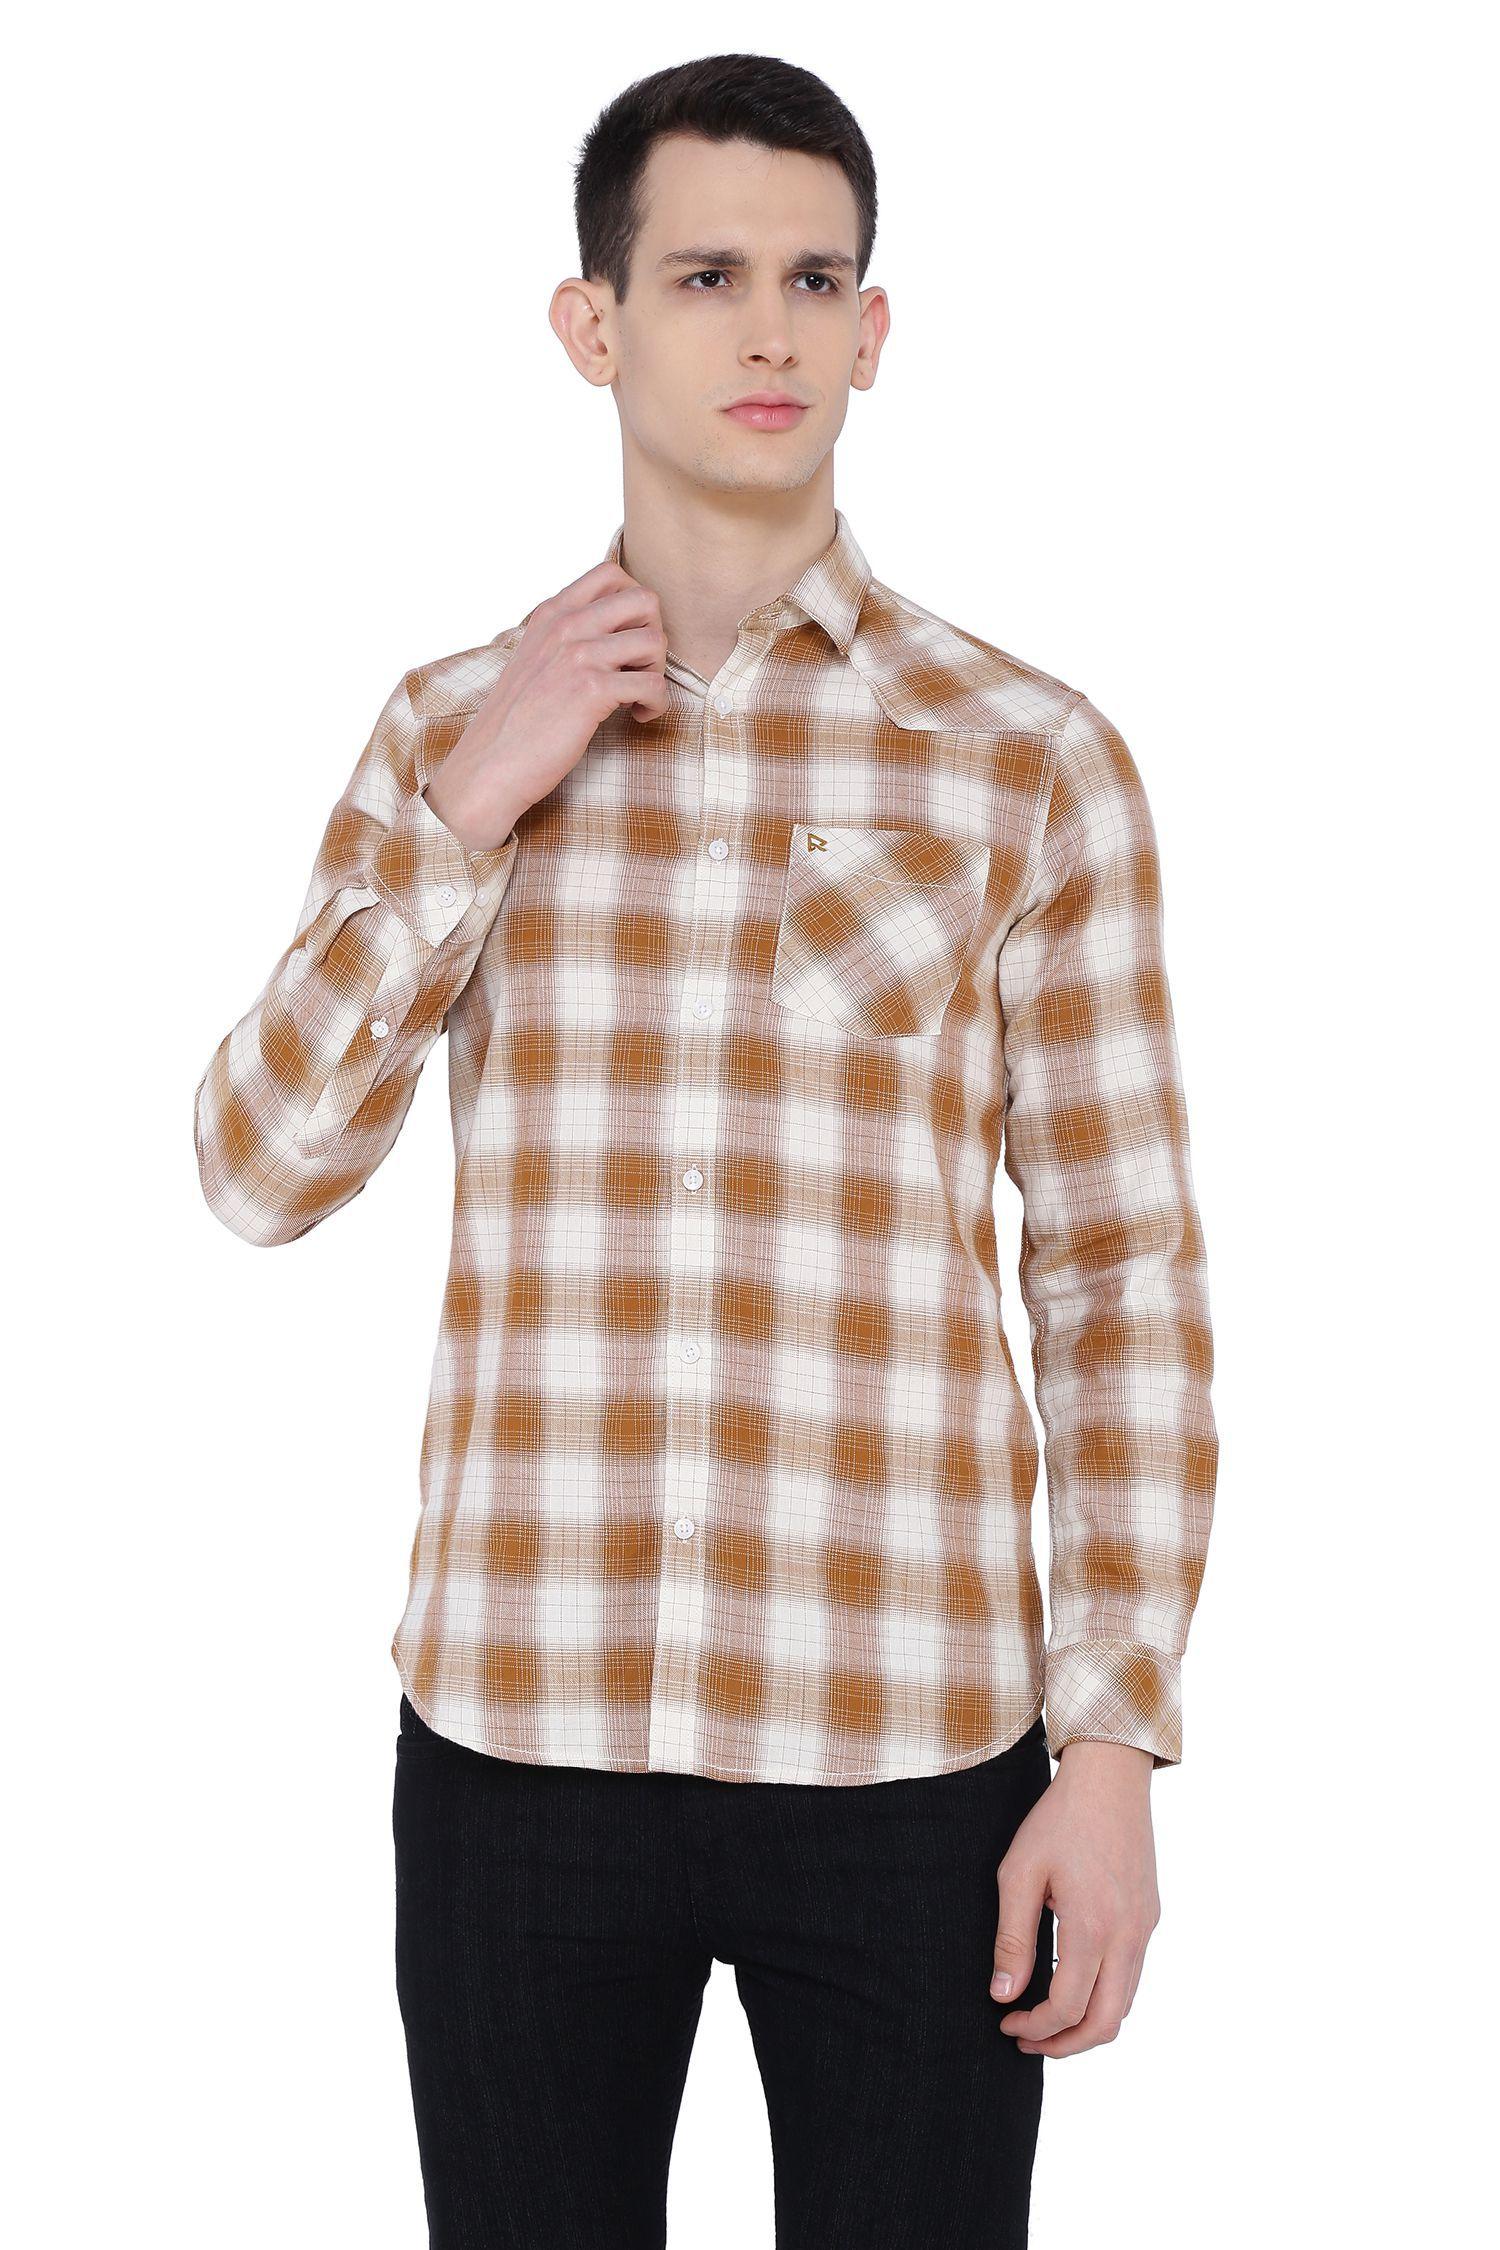 Risque 100 Percent Cotton Brown Checks Shirt